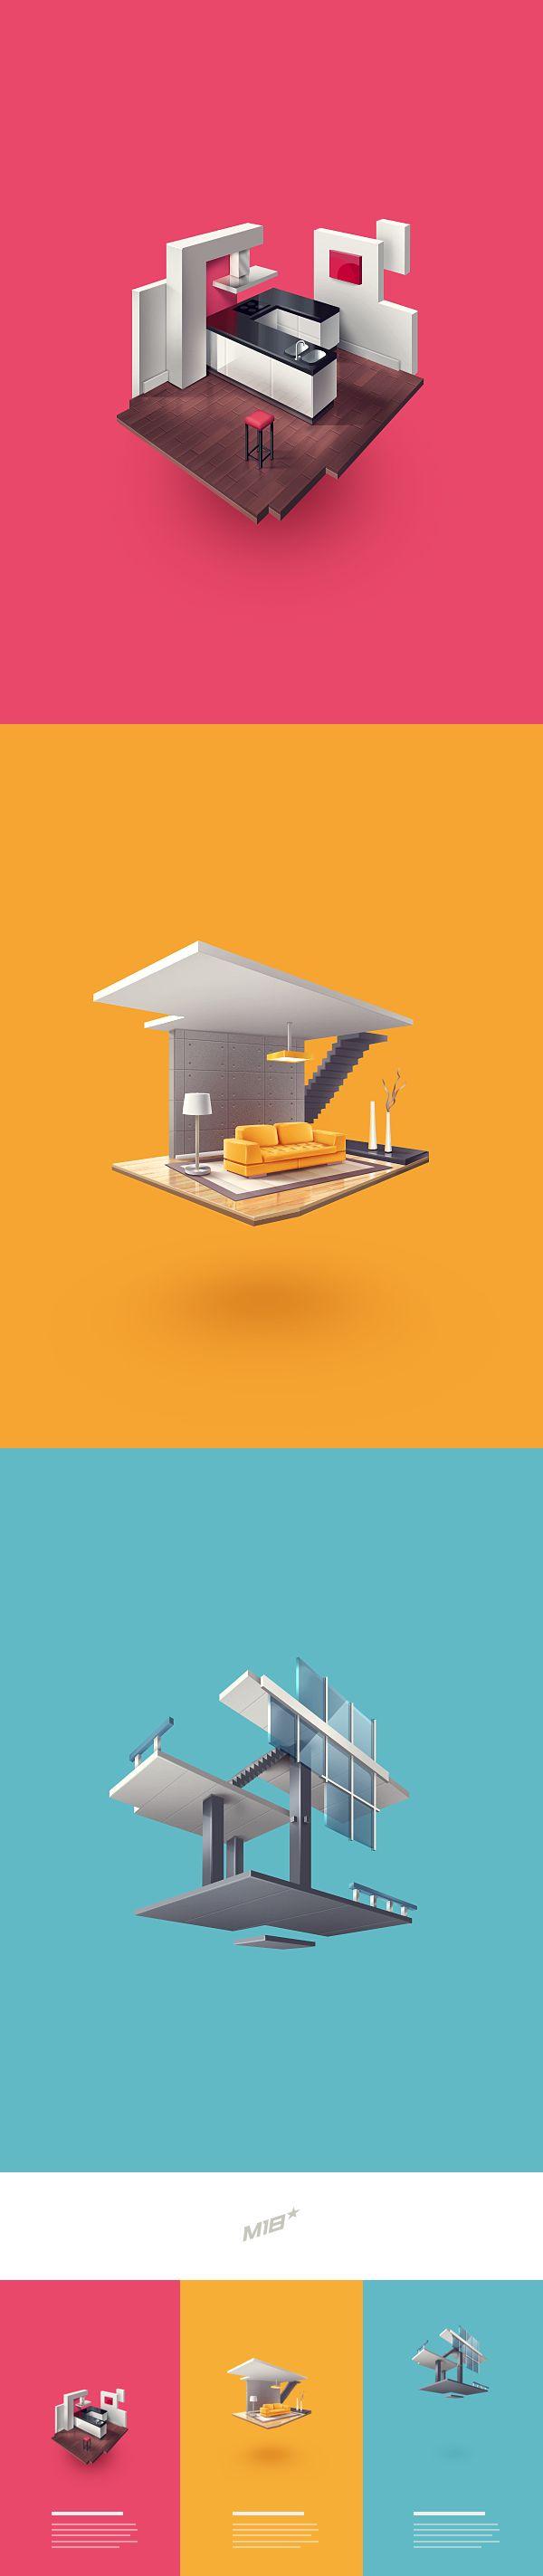 Block interior icons for Fabricator.